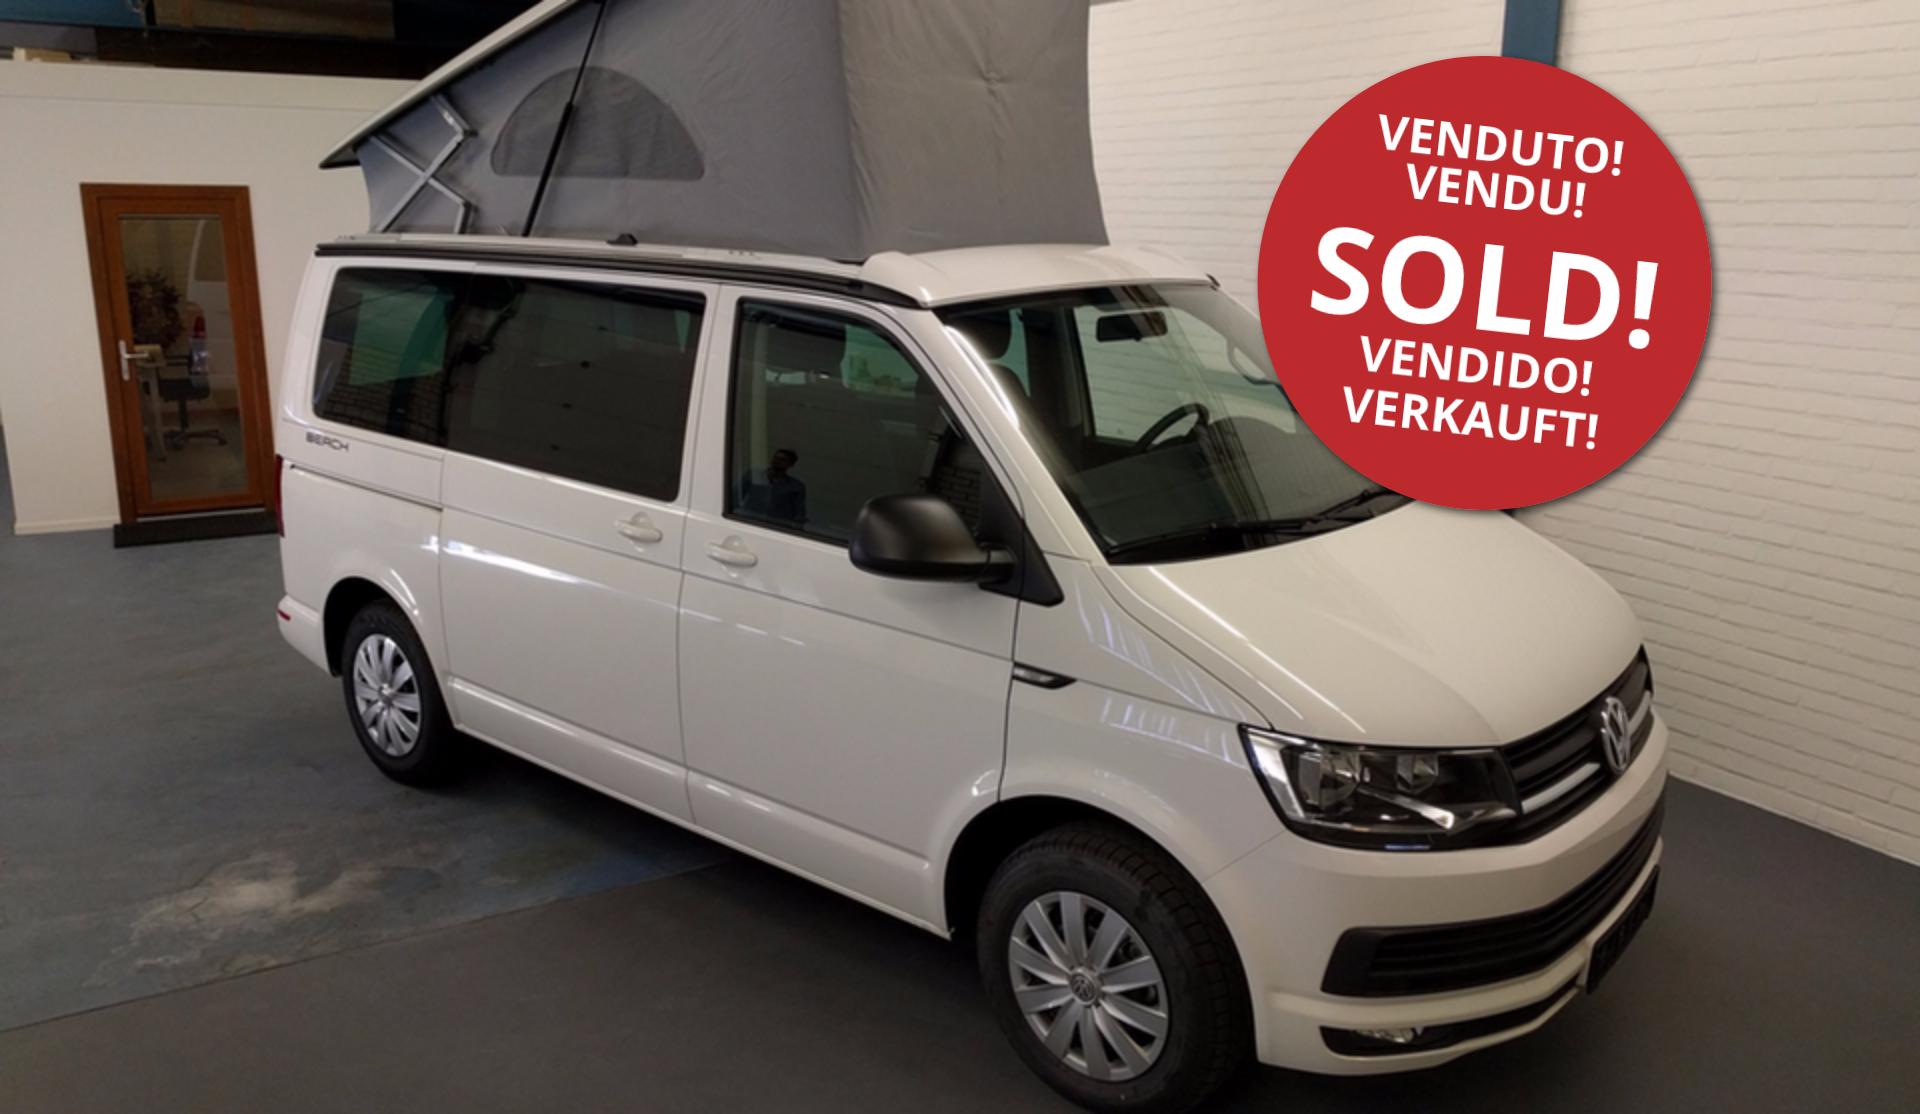 Jetzt zum Verkauf-Volkswagen California Beach VW T6 2,0 TDI 150hp